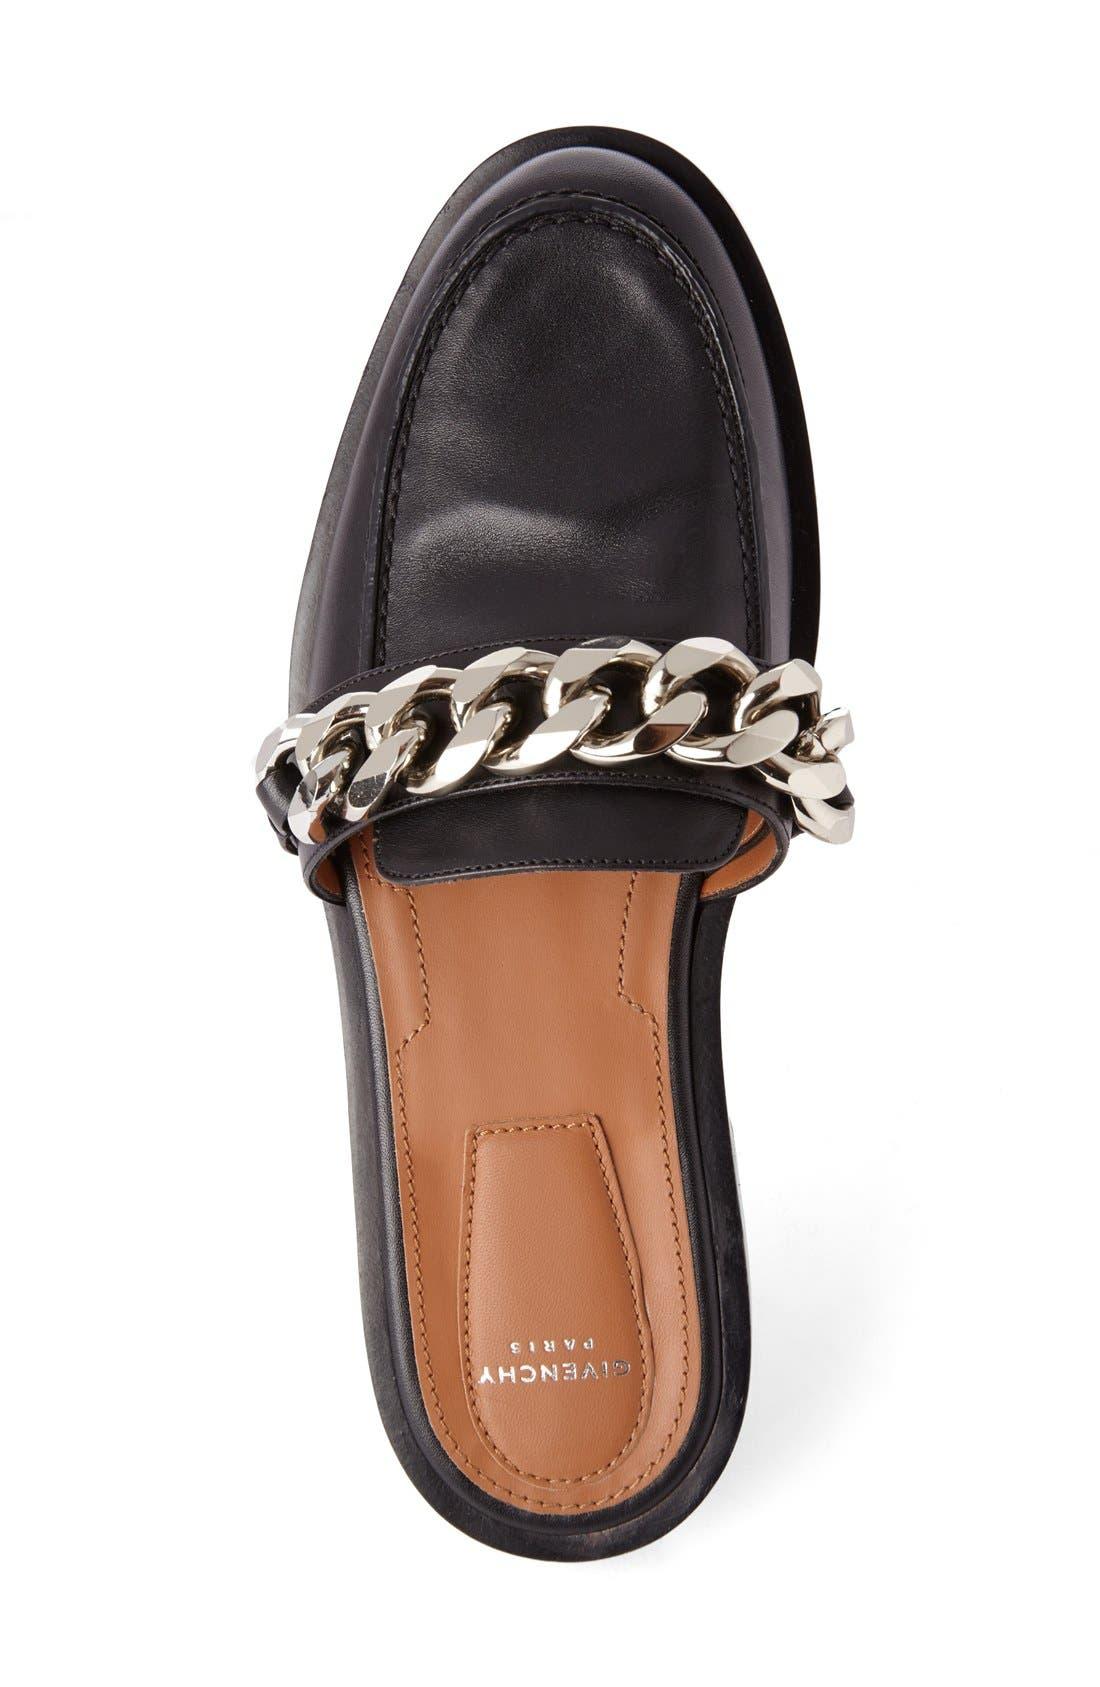 Chain Strap Loafer Mule,                             Alternate thumbnail 3, color,                             Black